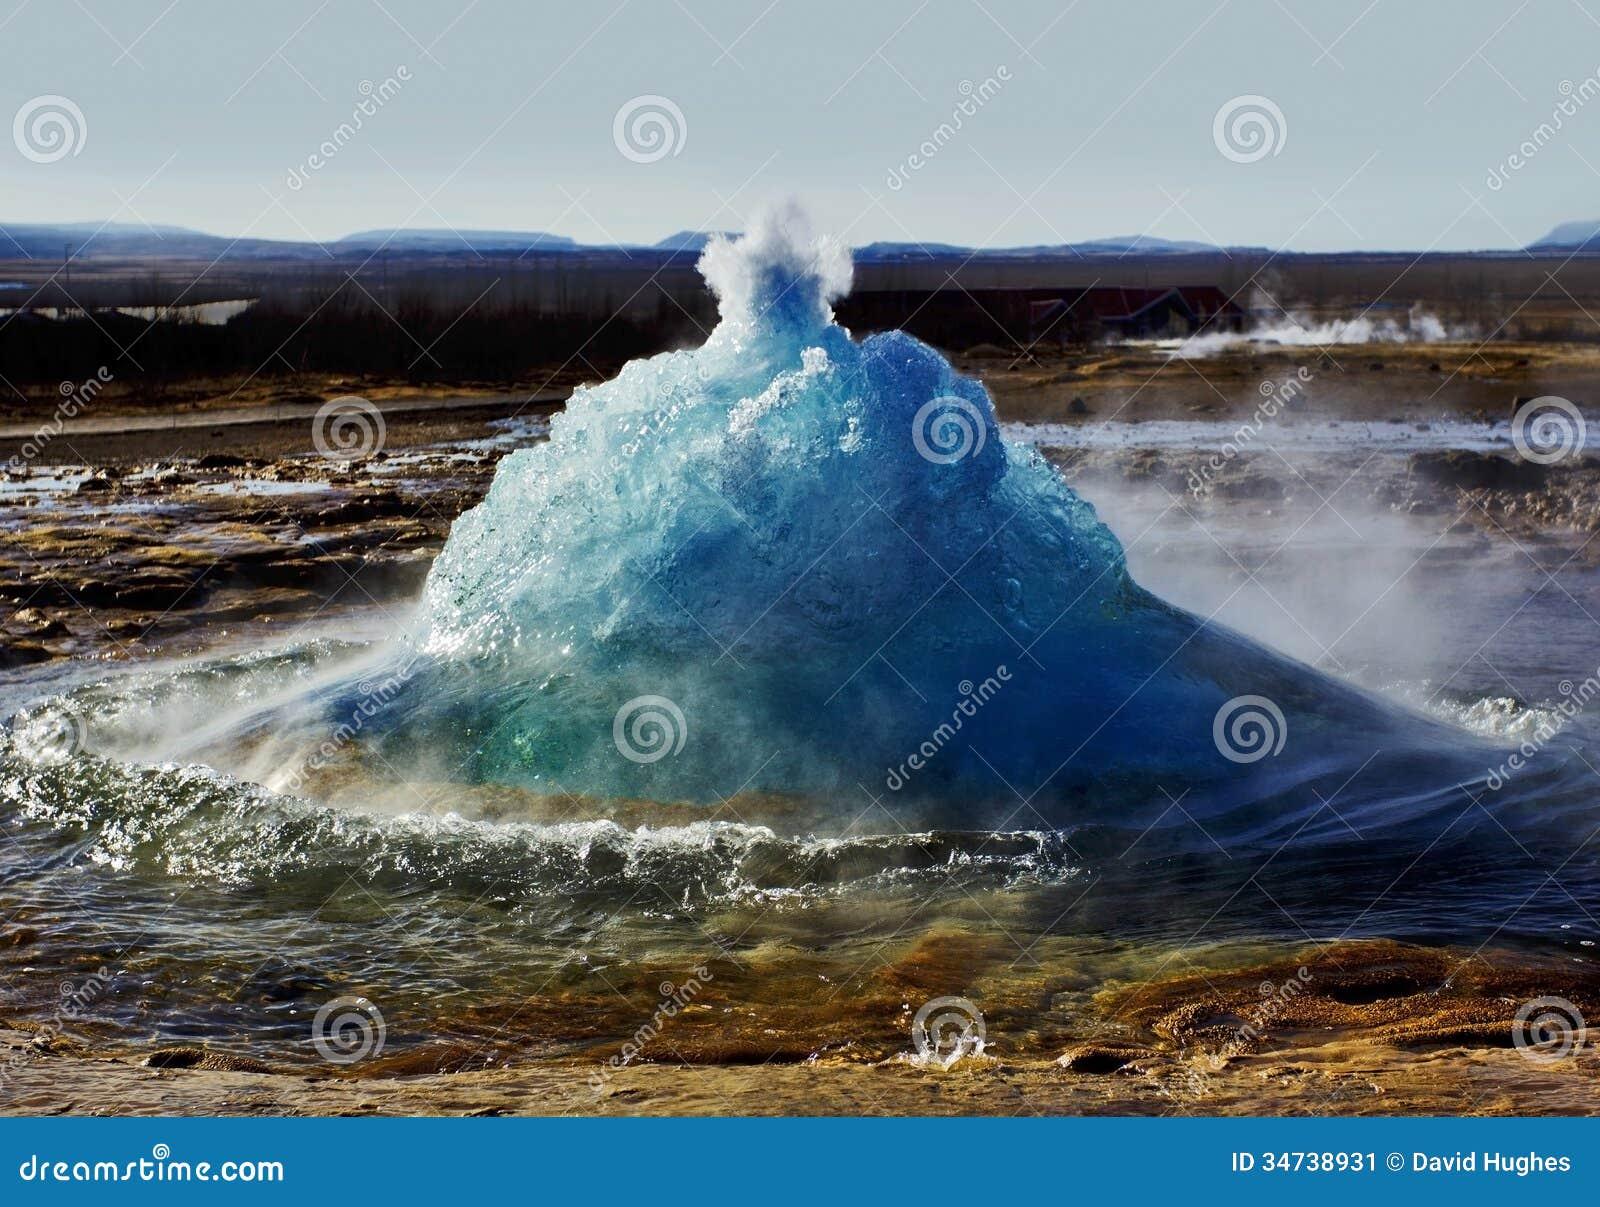 https://thumbs.dreamstime.com/z/breaking-free-strokkur-erupting-geysir-iceland-showing-moment-geothermal-steam-burst-bubble-geyser-one-34738931.jpg